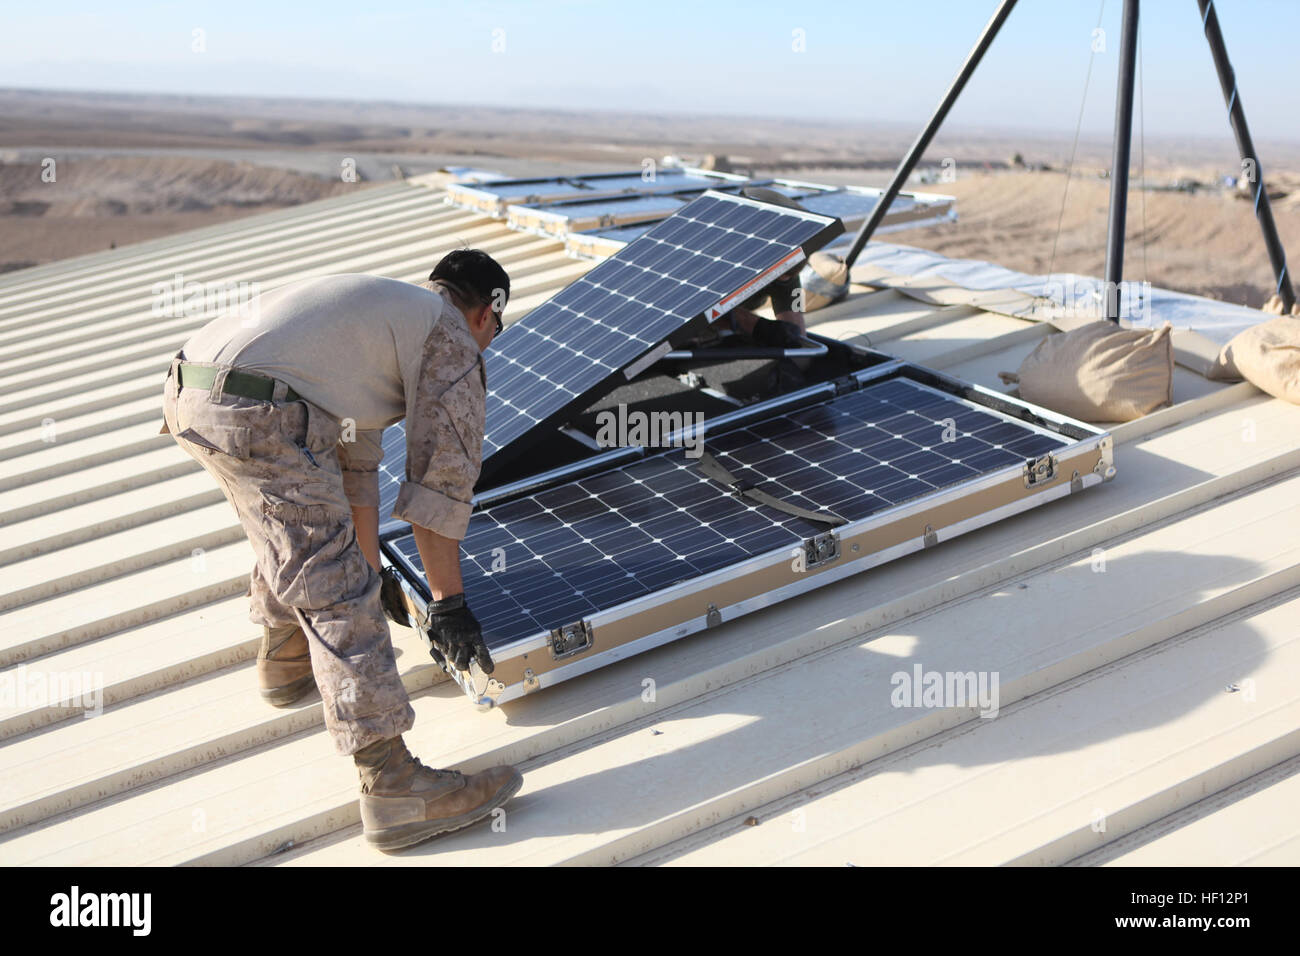 Marine solar panel installations first mate marine inc - U S Marine Cpl Moses E Perez A Field Wireman With Combat Logistics 15